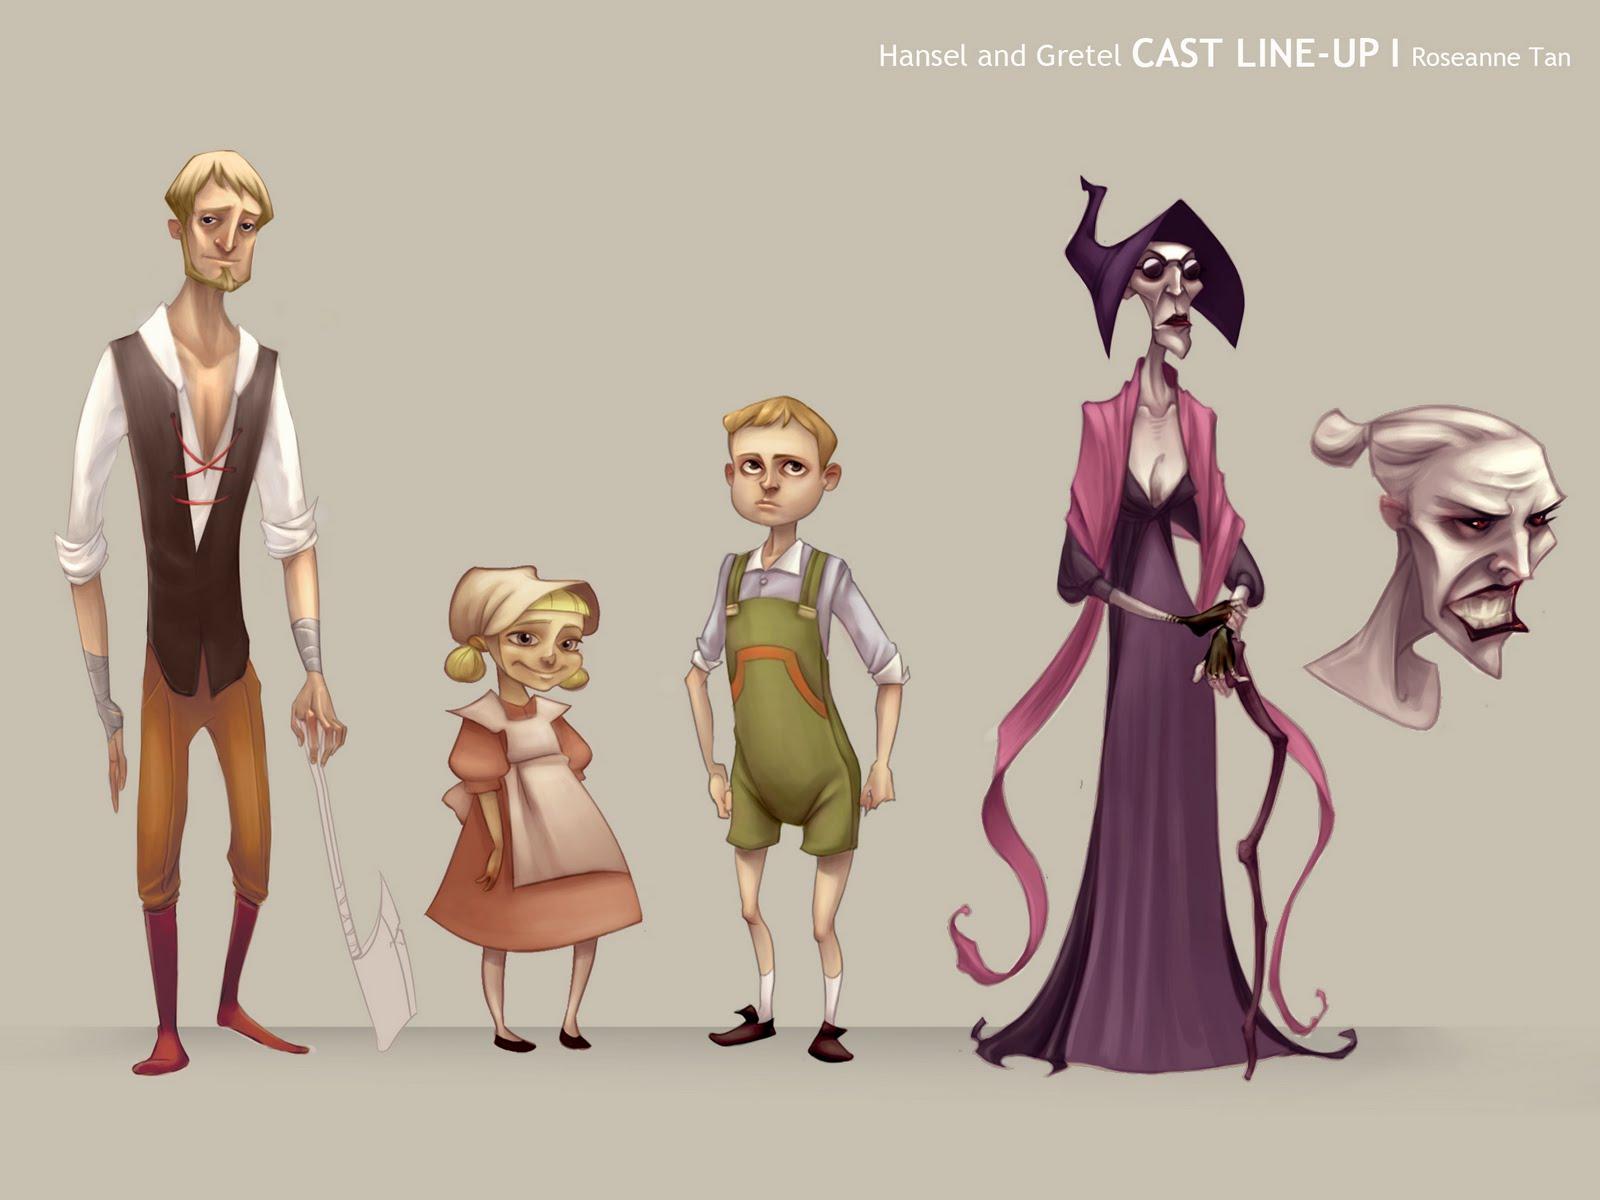 Animation Character Design Theory : Tan art hansel and gretel cda